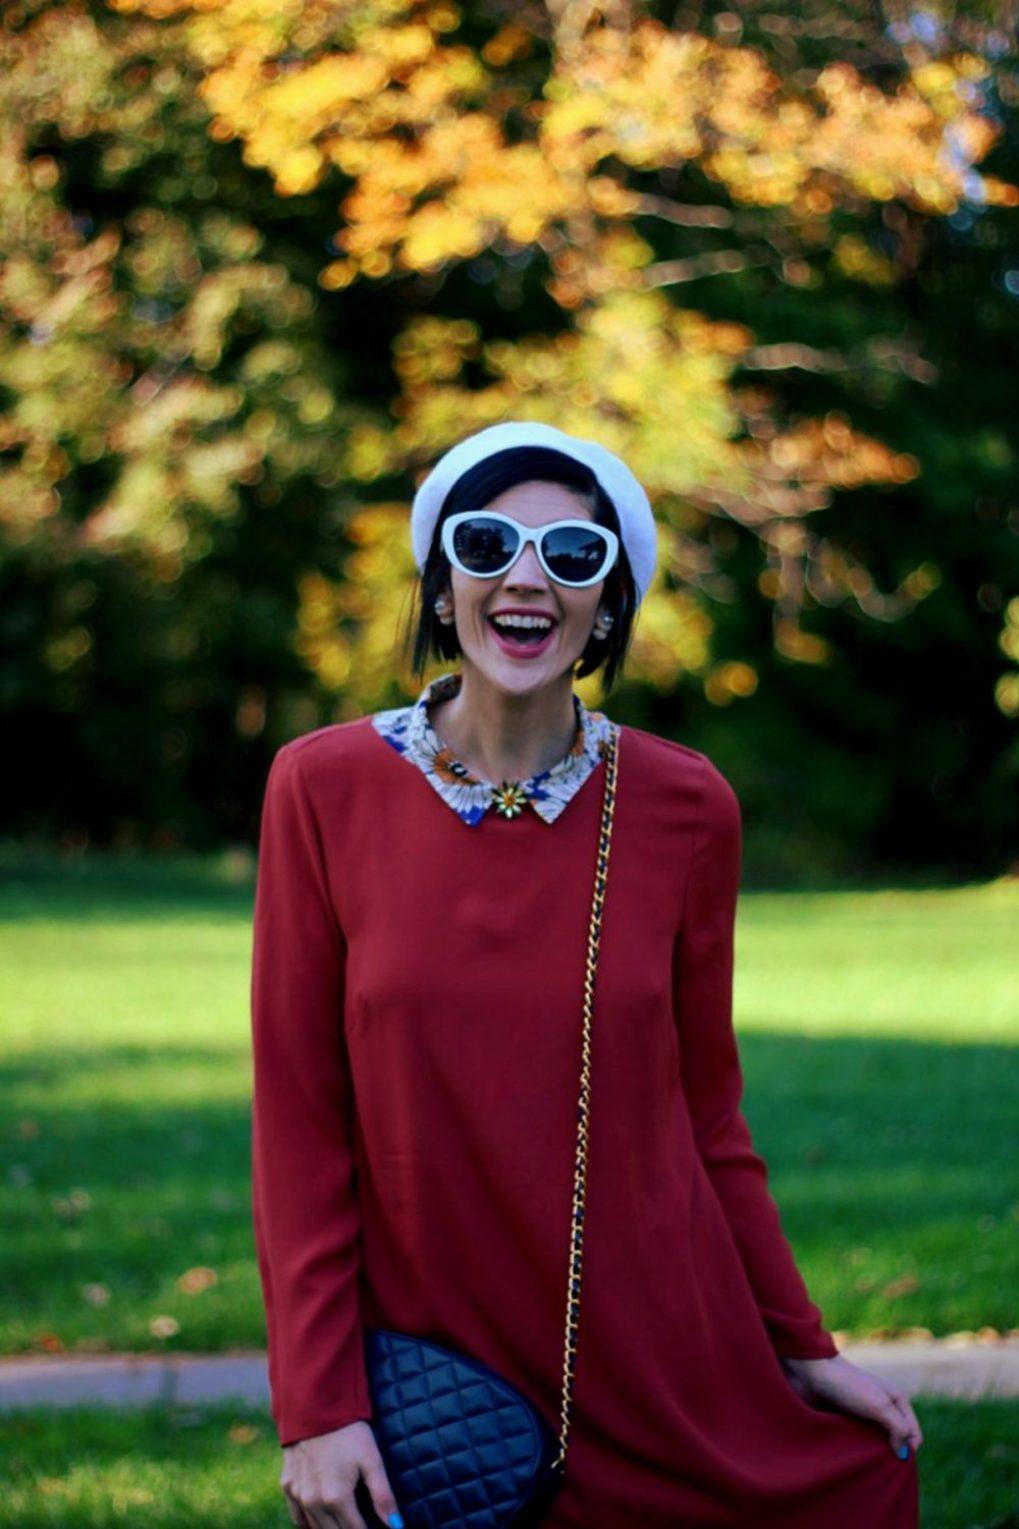 Outfit: Orange retro style dress, flower collar, jewel flower brooch, cream colored beret, navy purse